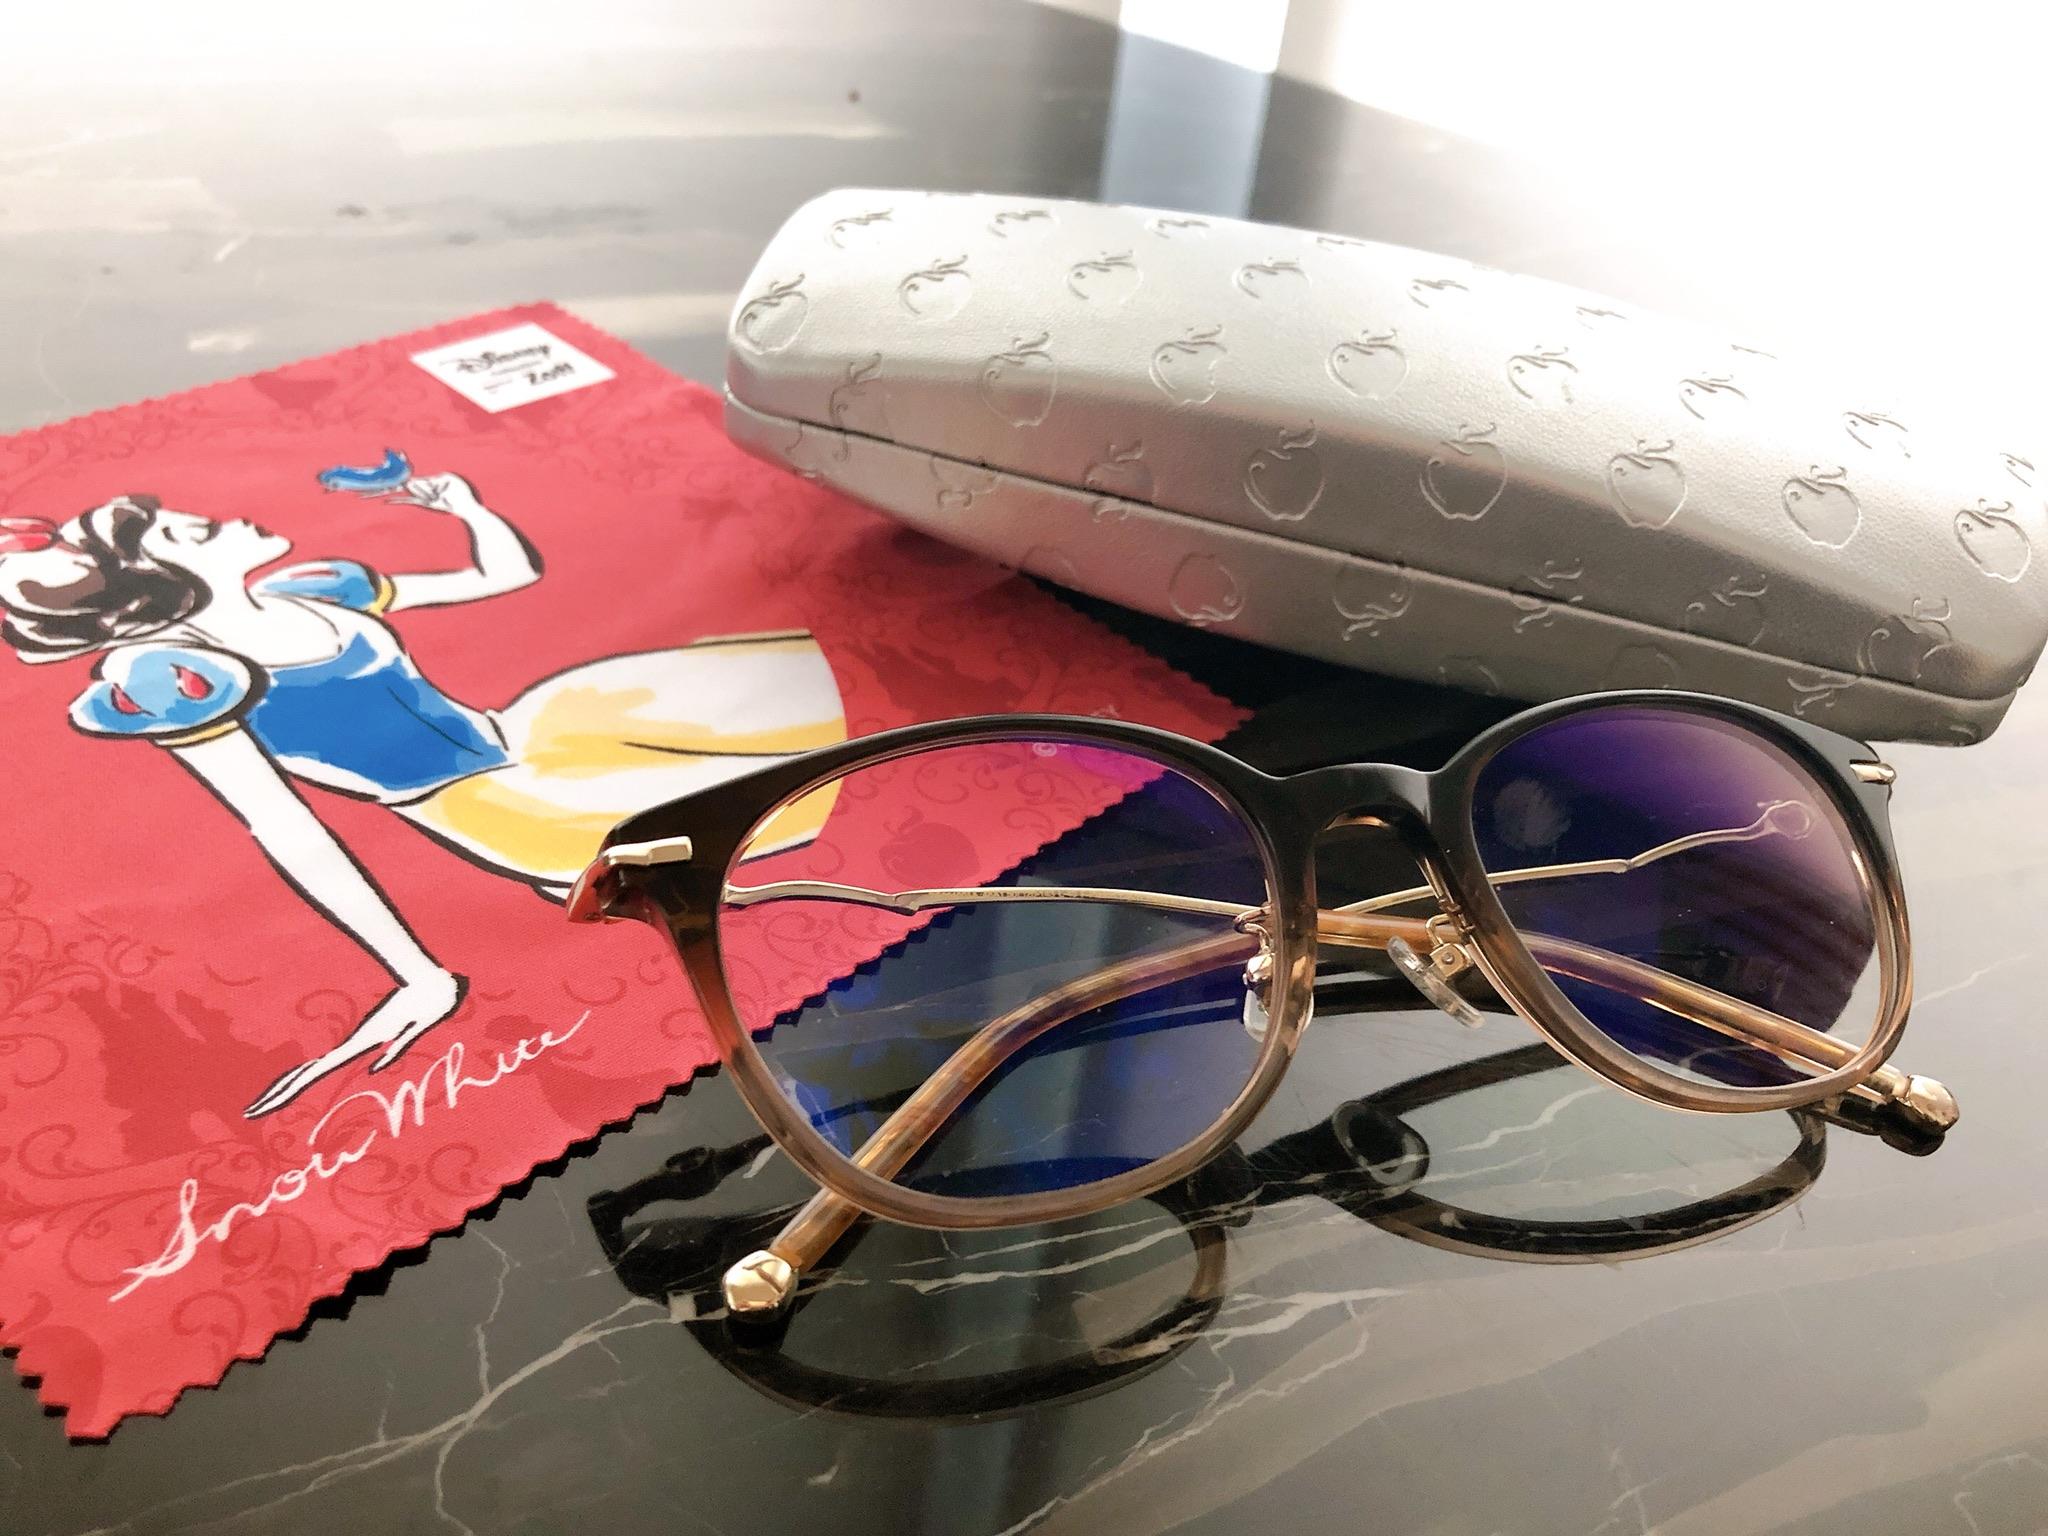 【Zoff】アクセサリーみたいな可愛さ♡ディズニープリンセスのメガネに一目惚れ(๑>◡<๑)! ブルーライトカット仕様は追加料金0円!_1